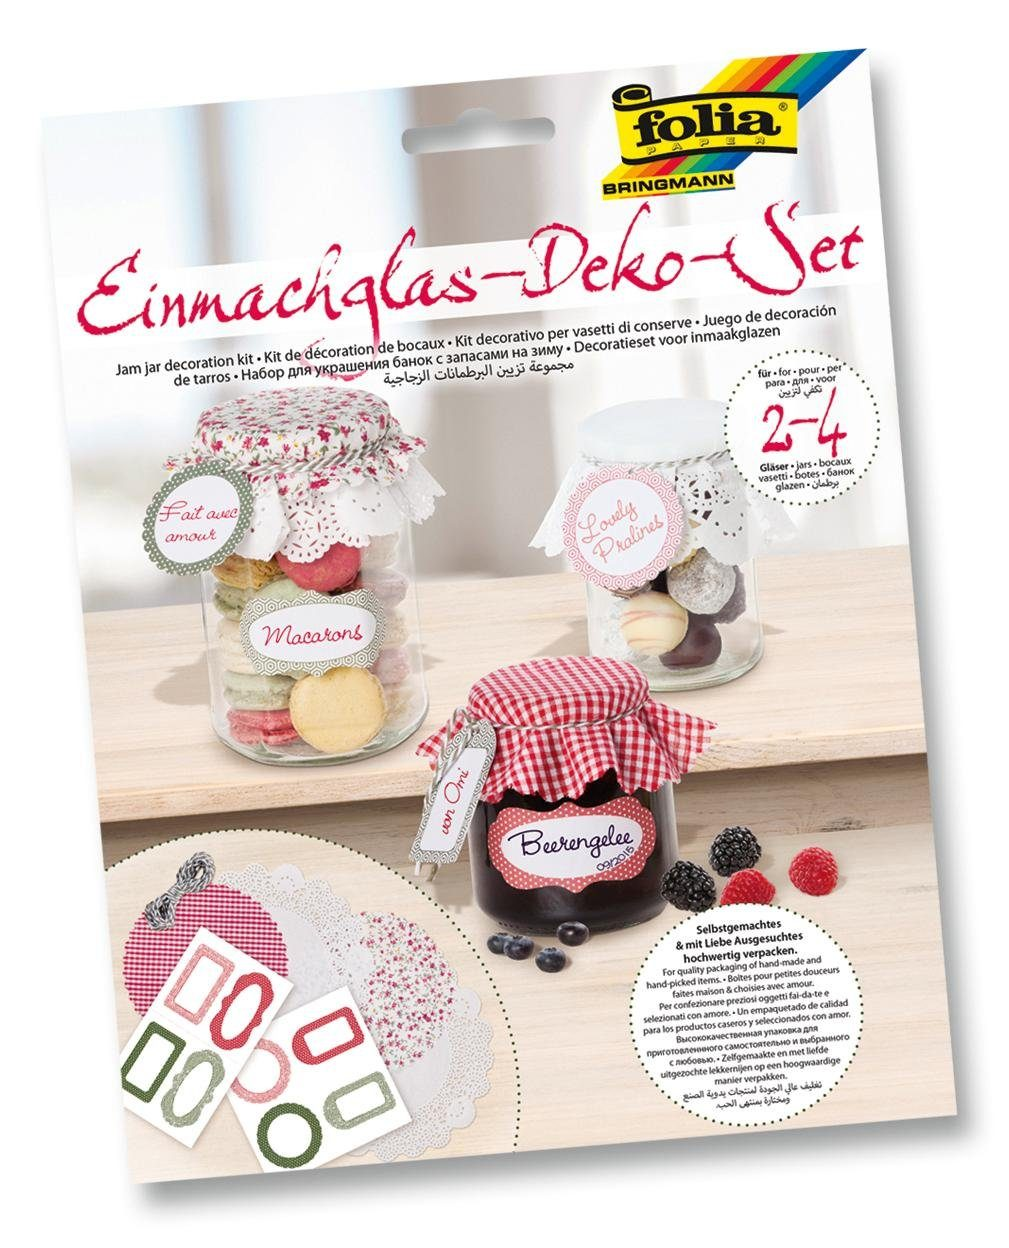 Folia Einmachglas-Deko-Set, rot/grün